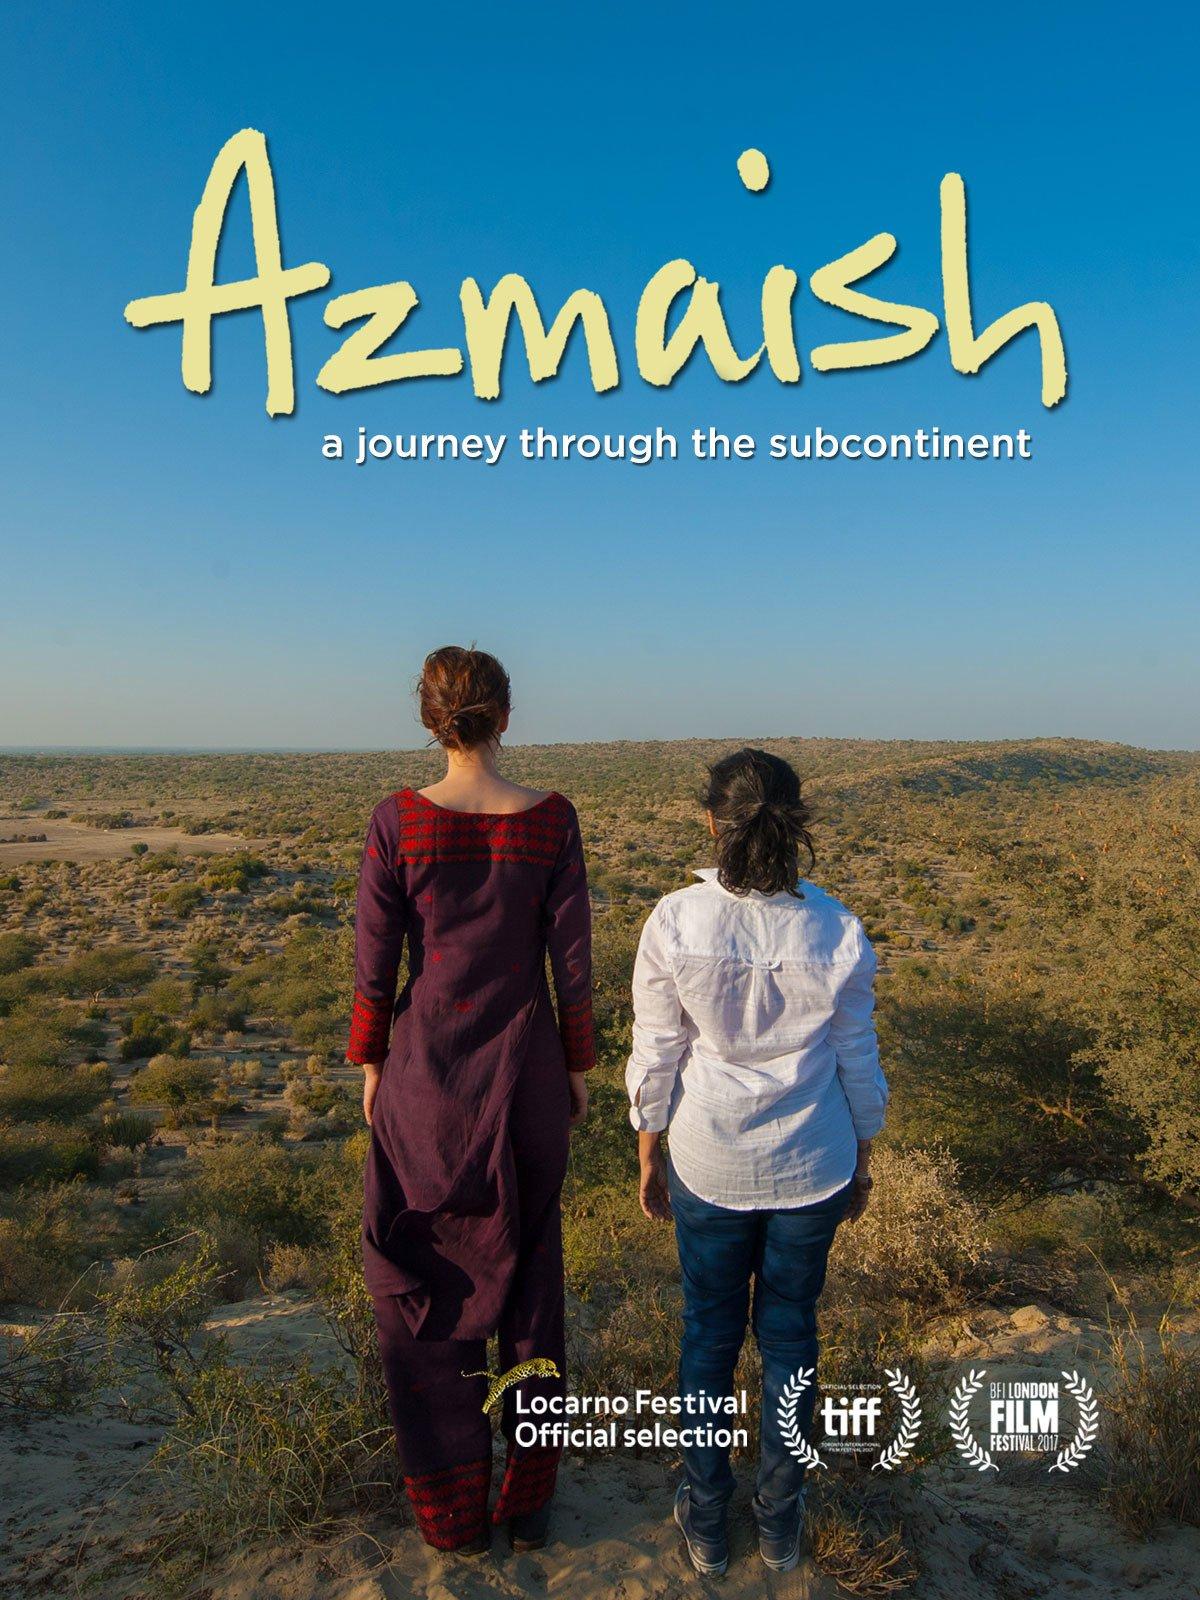 Azmaish a journey through the subcontinent